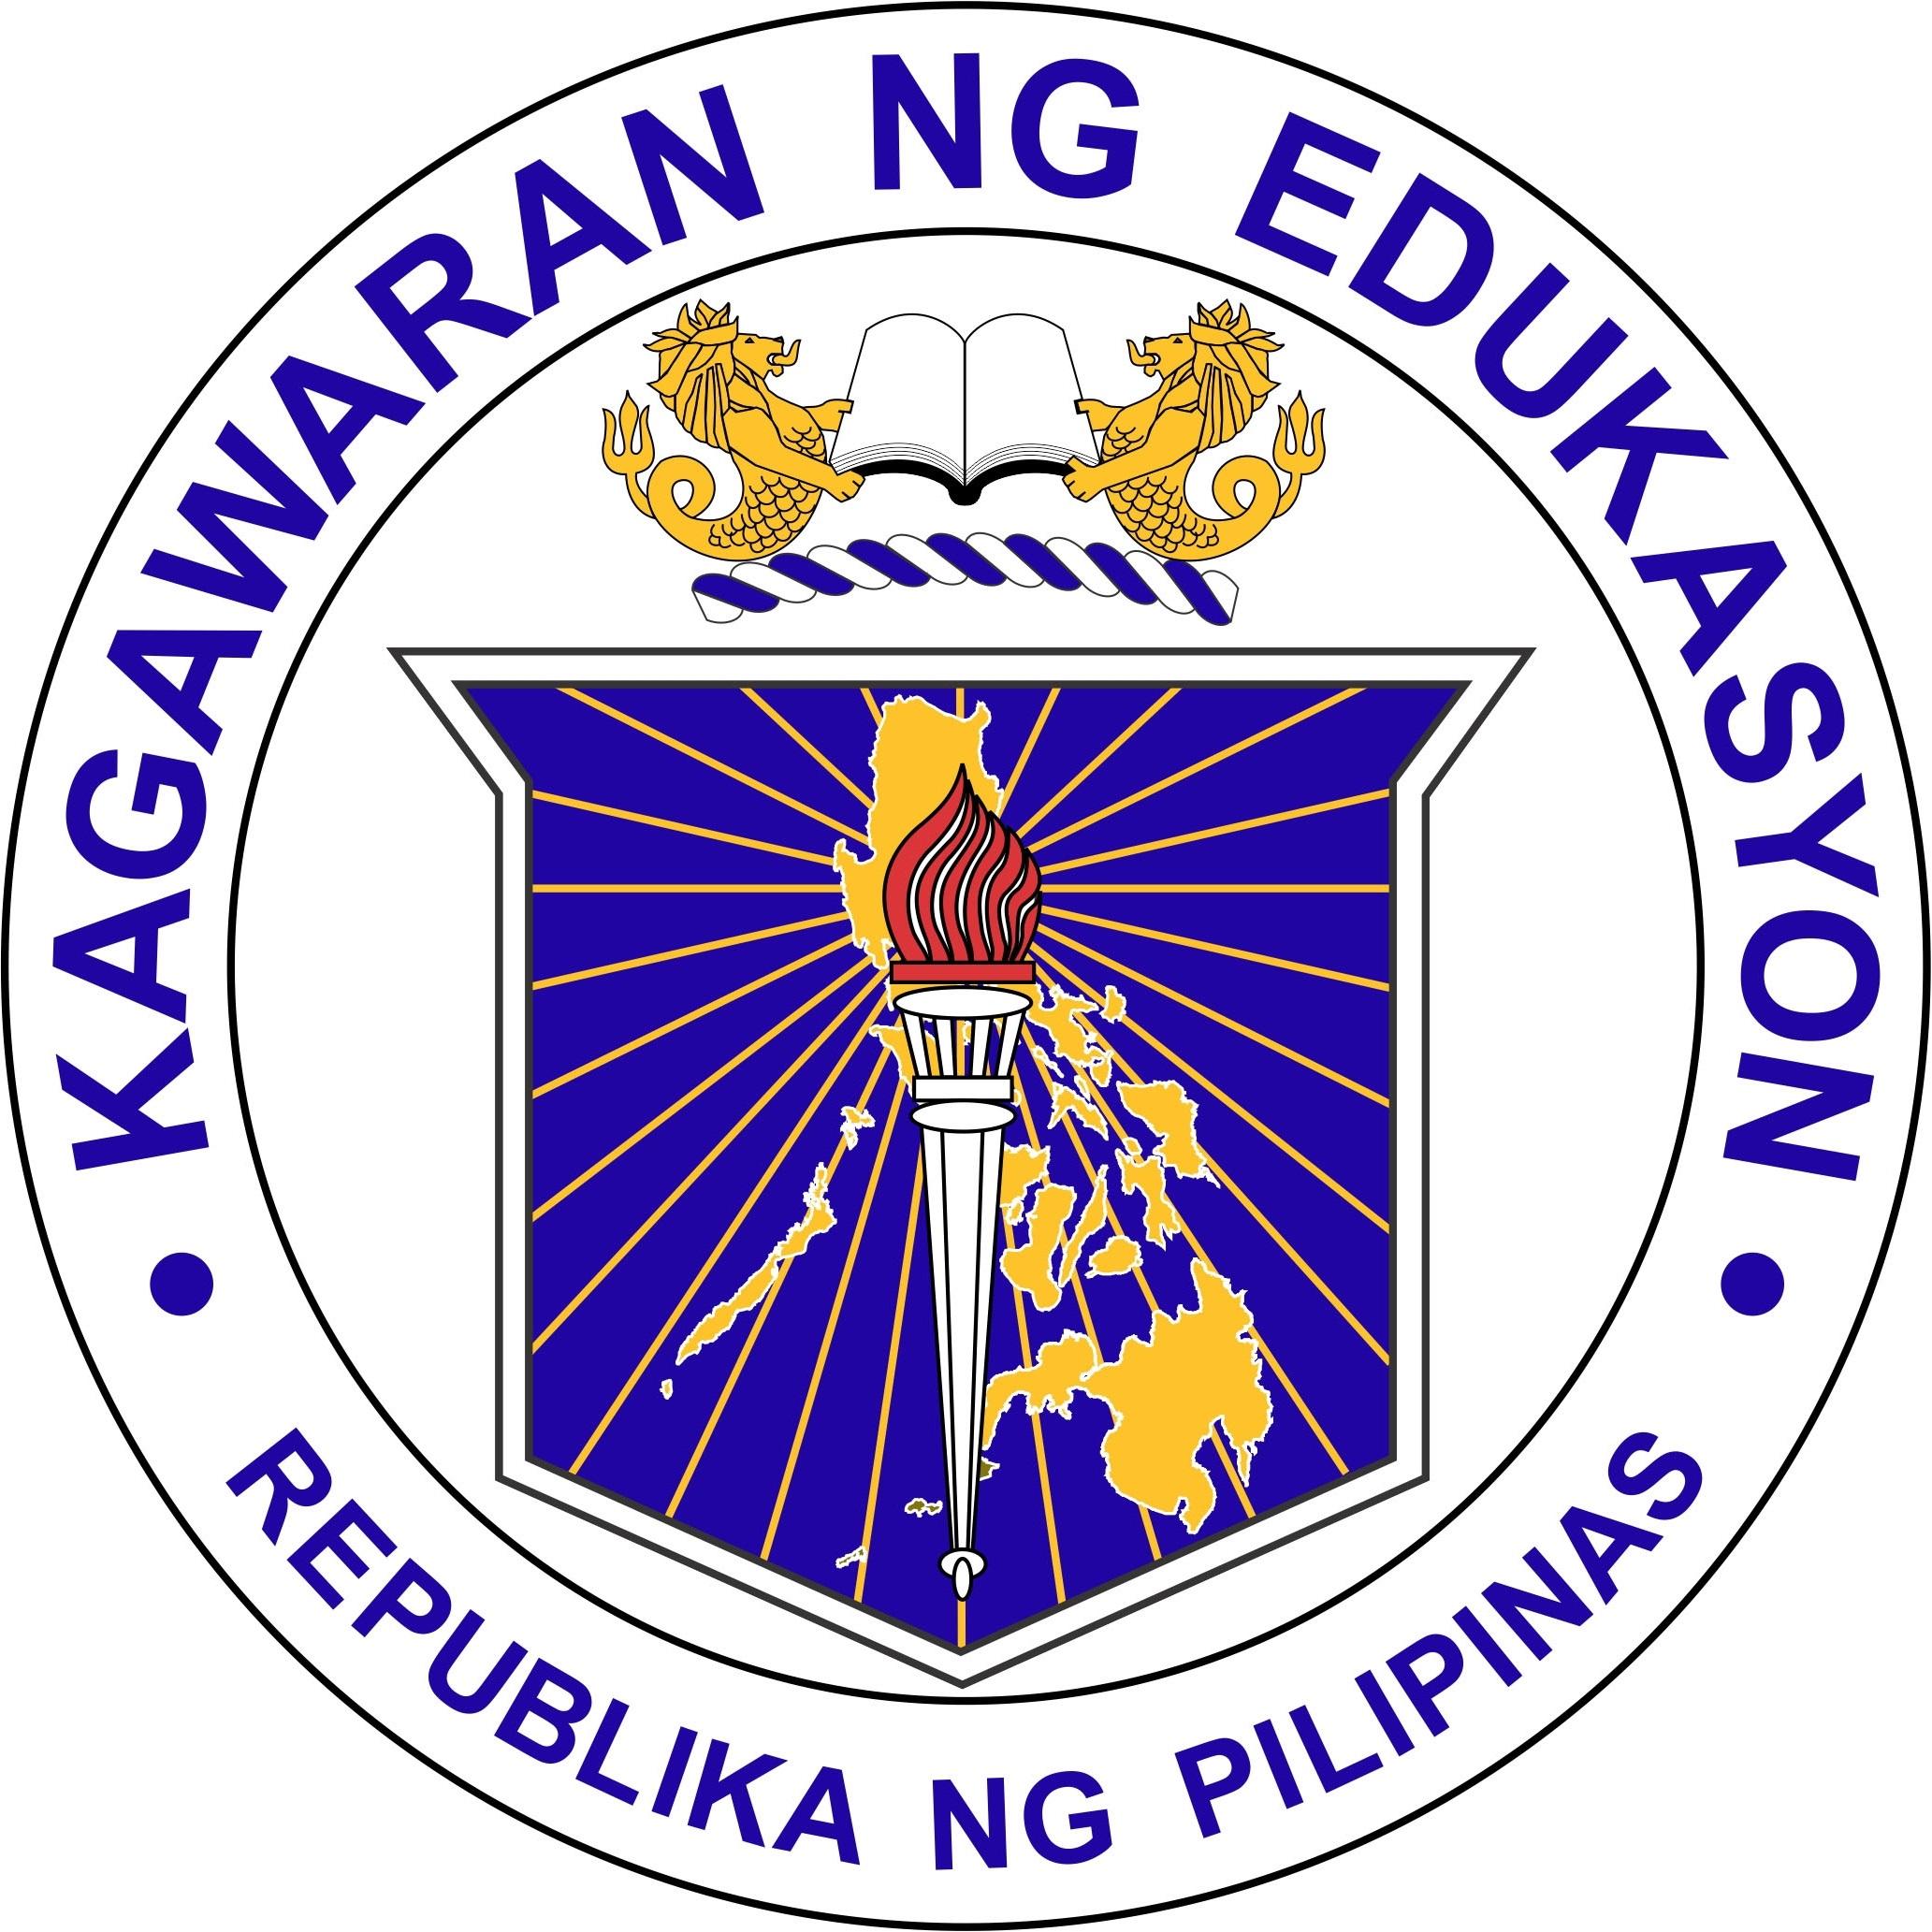 Deped logo clipart clip transparent DepEd Logo [Department of Education Philippines - deped.gov.ph] Free ... clip transparent